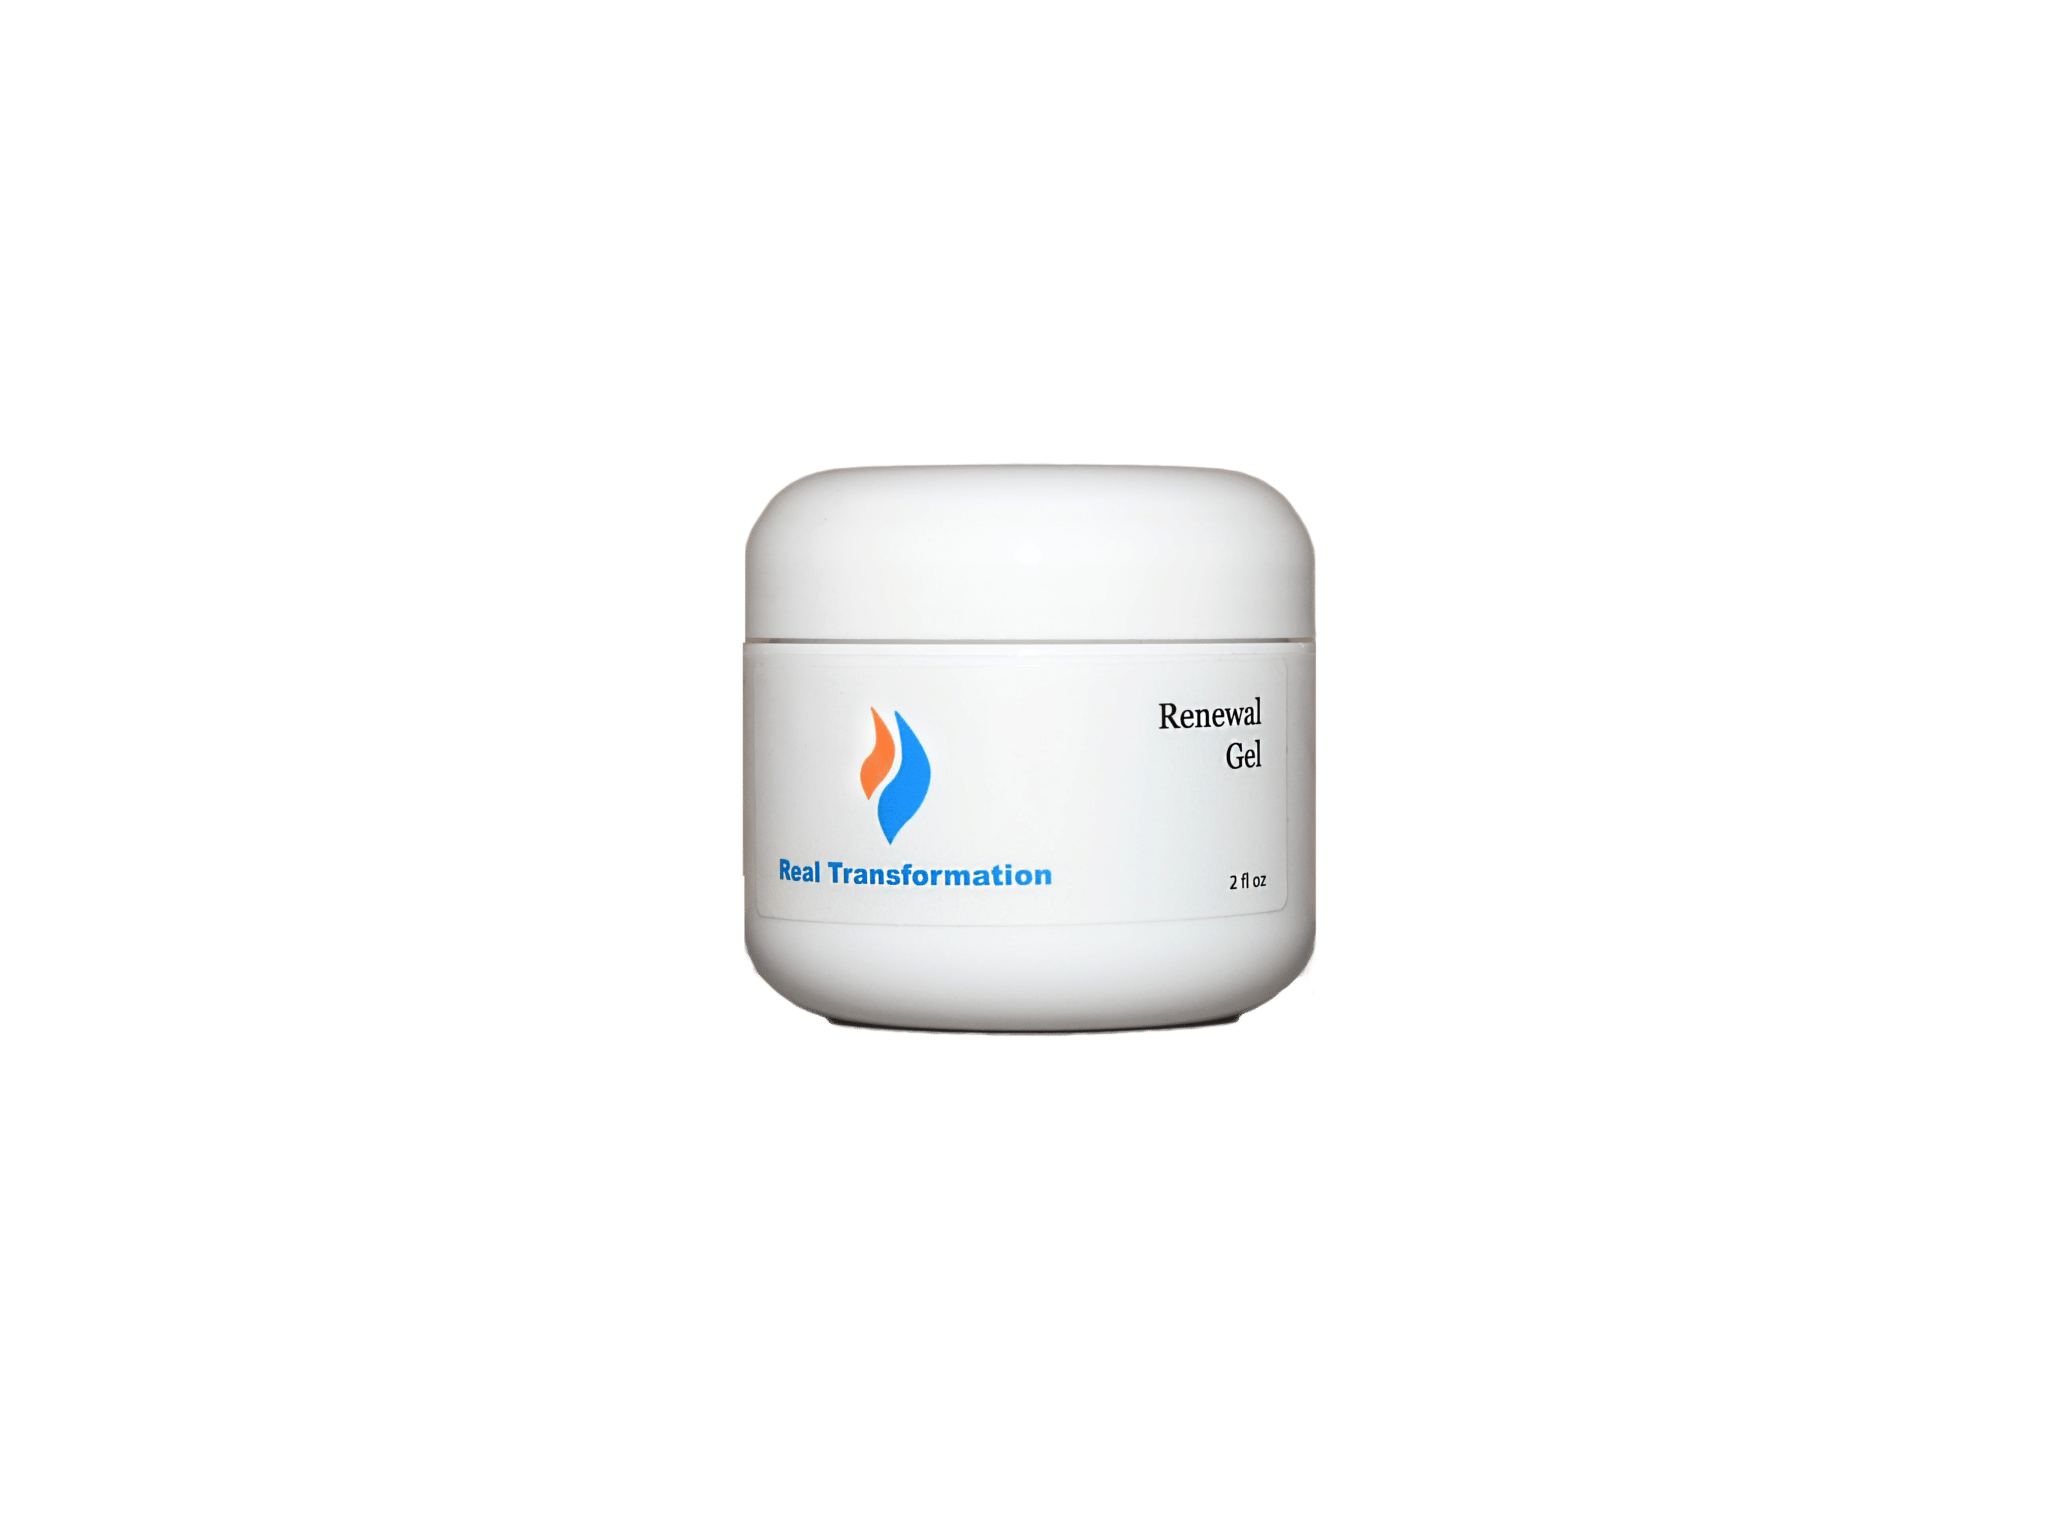 renewal gel real transformation skin care